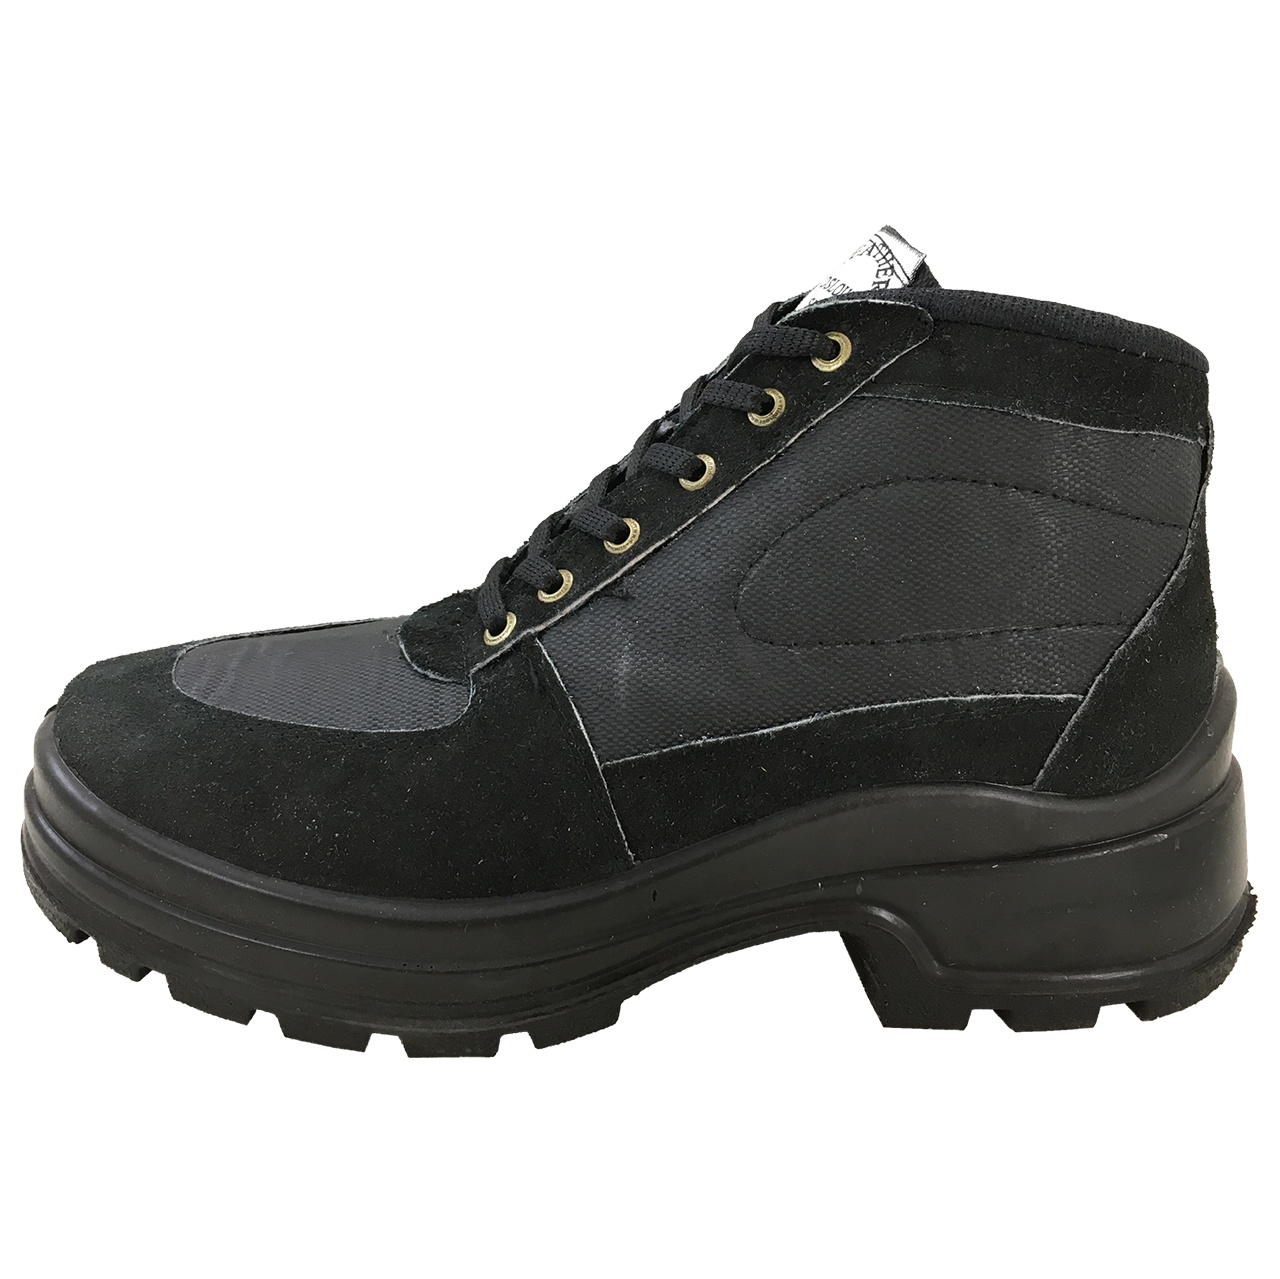 کفش کوهنوردی مردانه اسلوبی مدل دماوند کد ۲۷۰۲